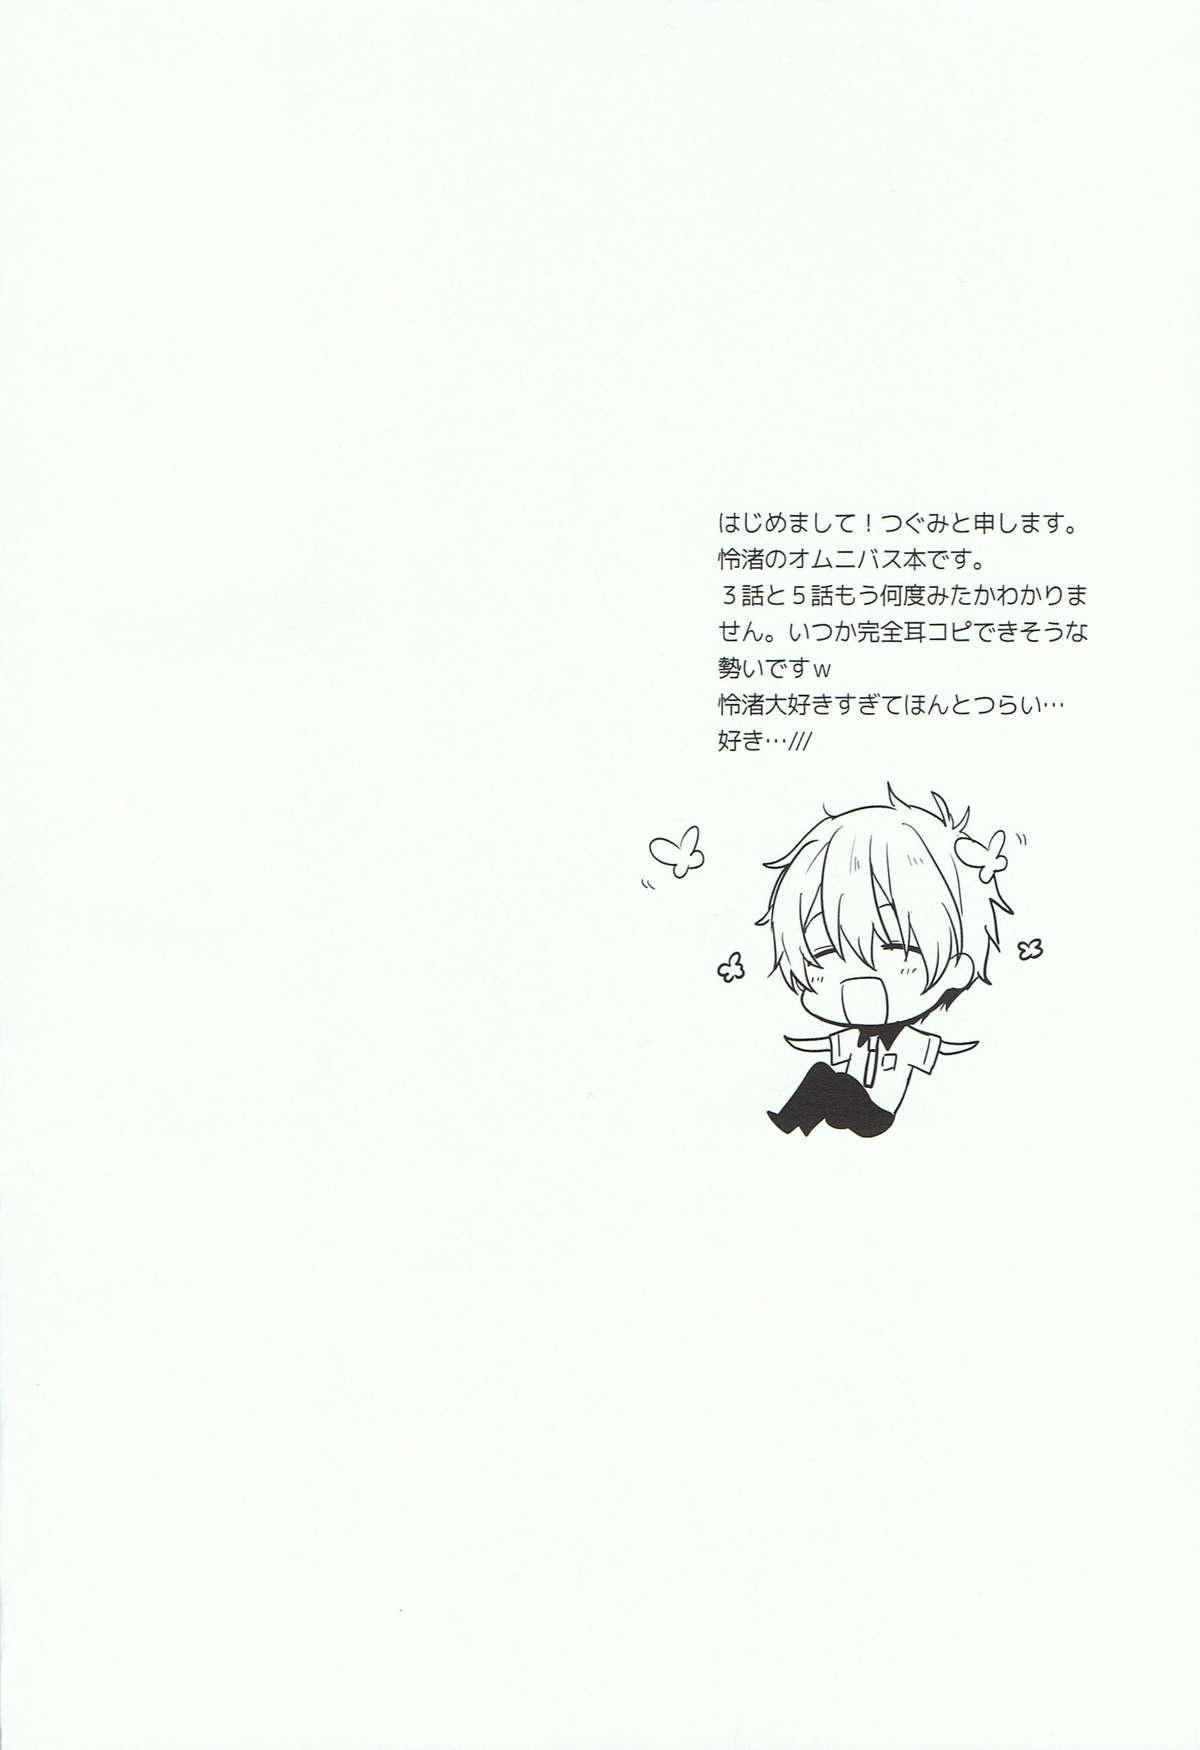 Nagisa-kun de ii deshou! 2